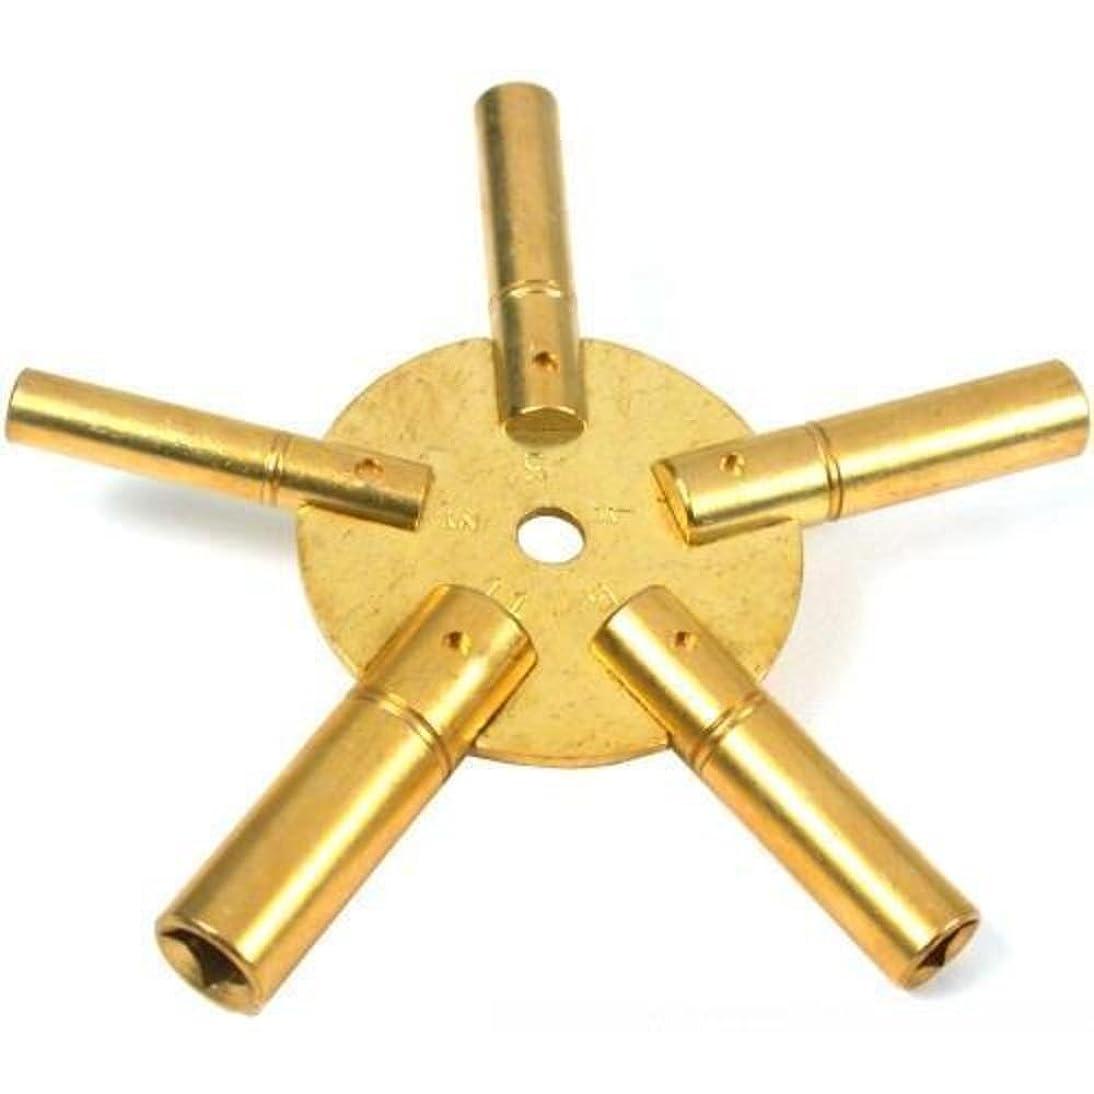 Mainspring Winder Clock Key Tool 5 Sizes Jewelers